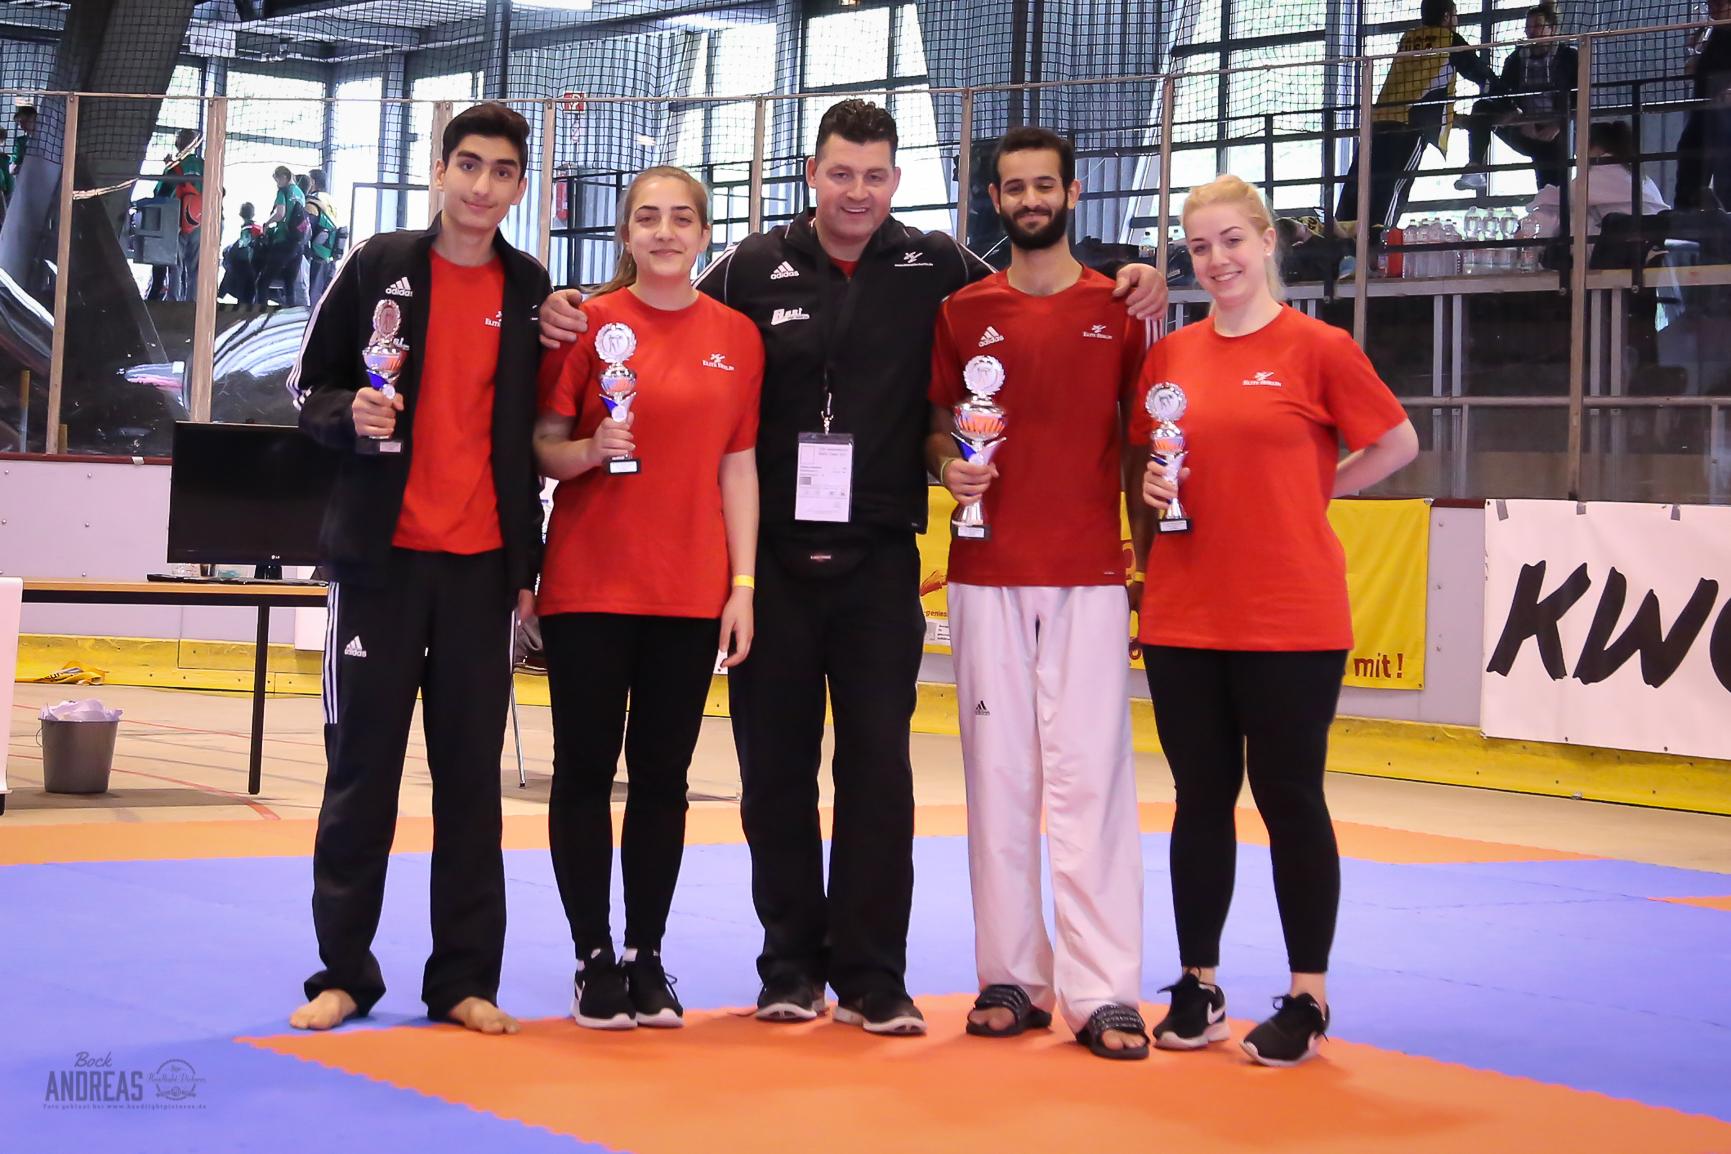 Taekwondo Elite Berlin gewinnt den 2. Platz in der Mannschaftswertung bei der Berlin Open 2017